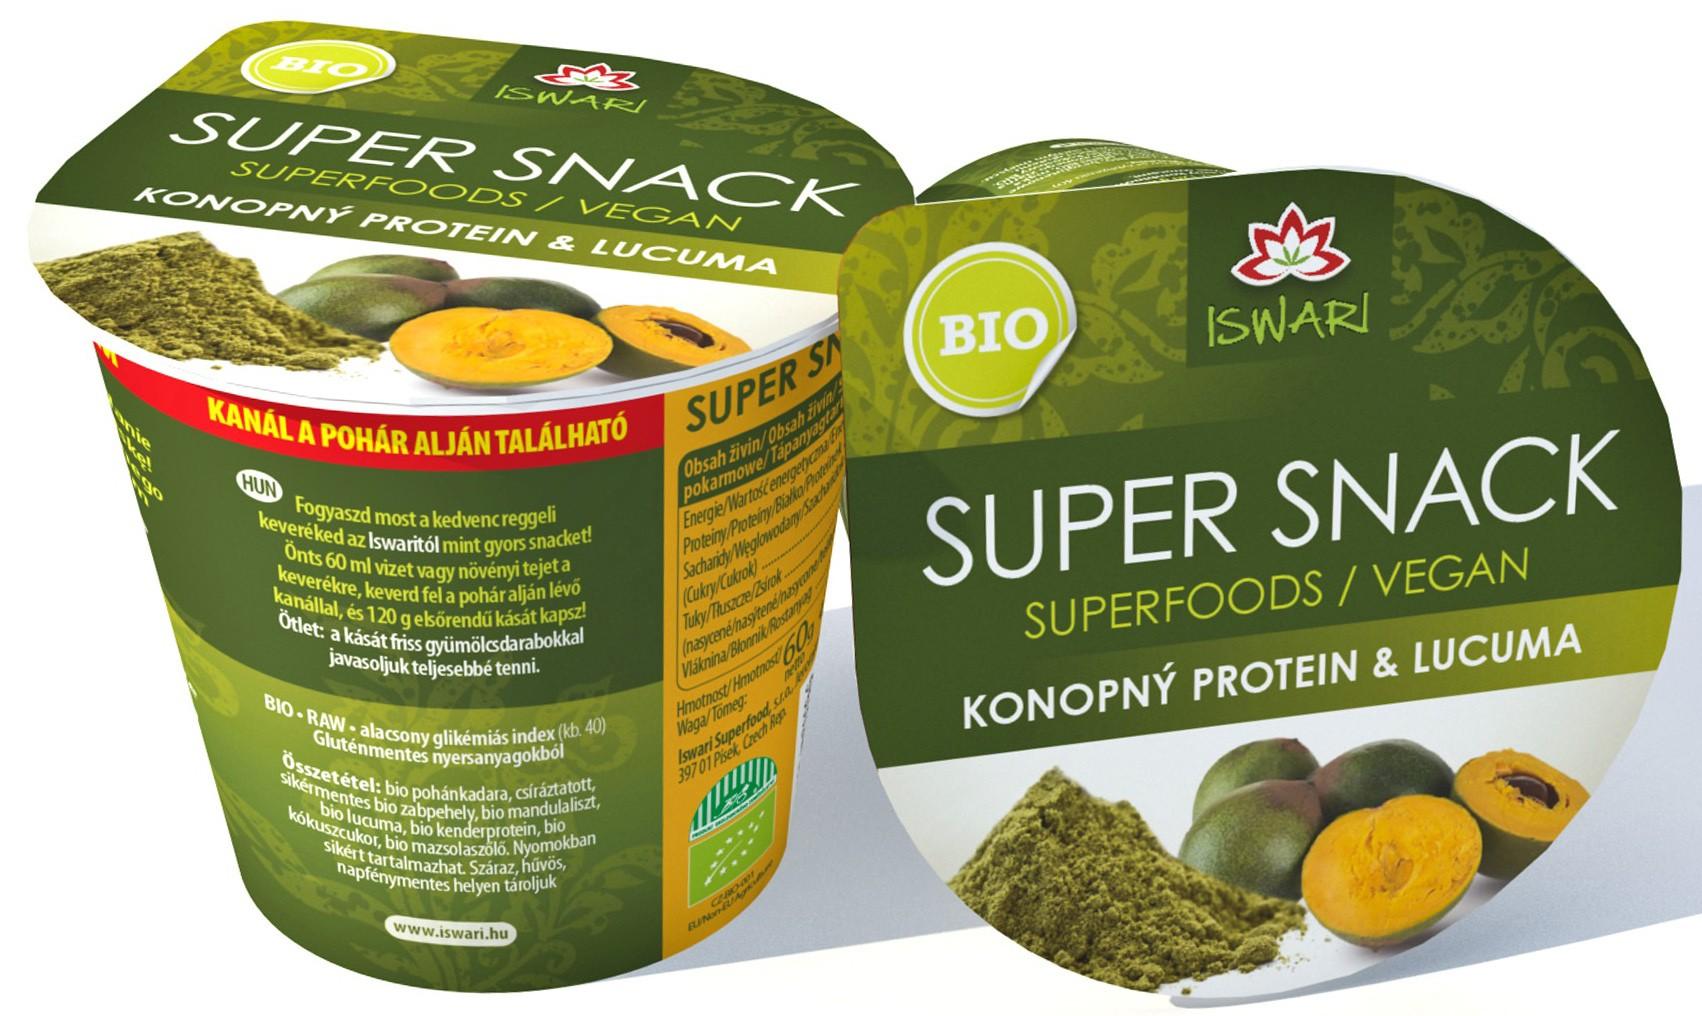 Konopný protein - lucuma 60g - Supersnack